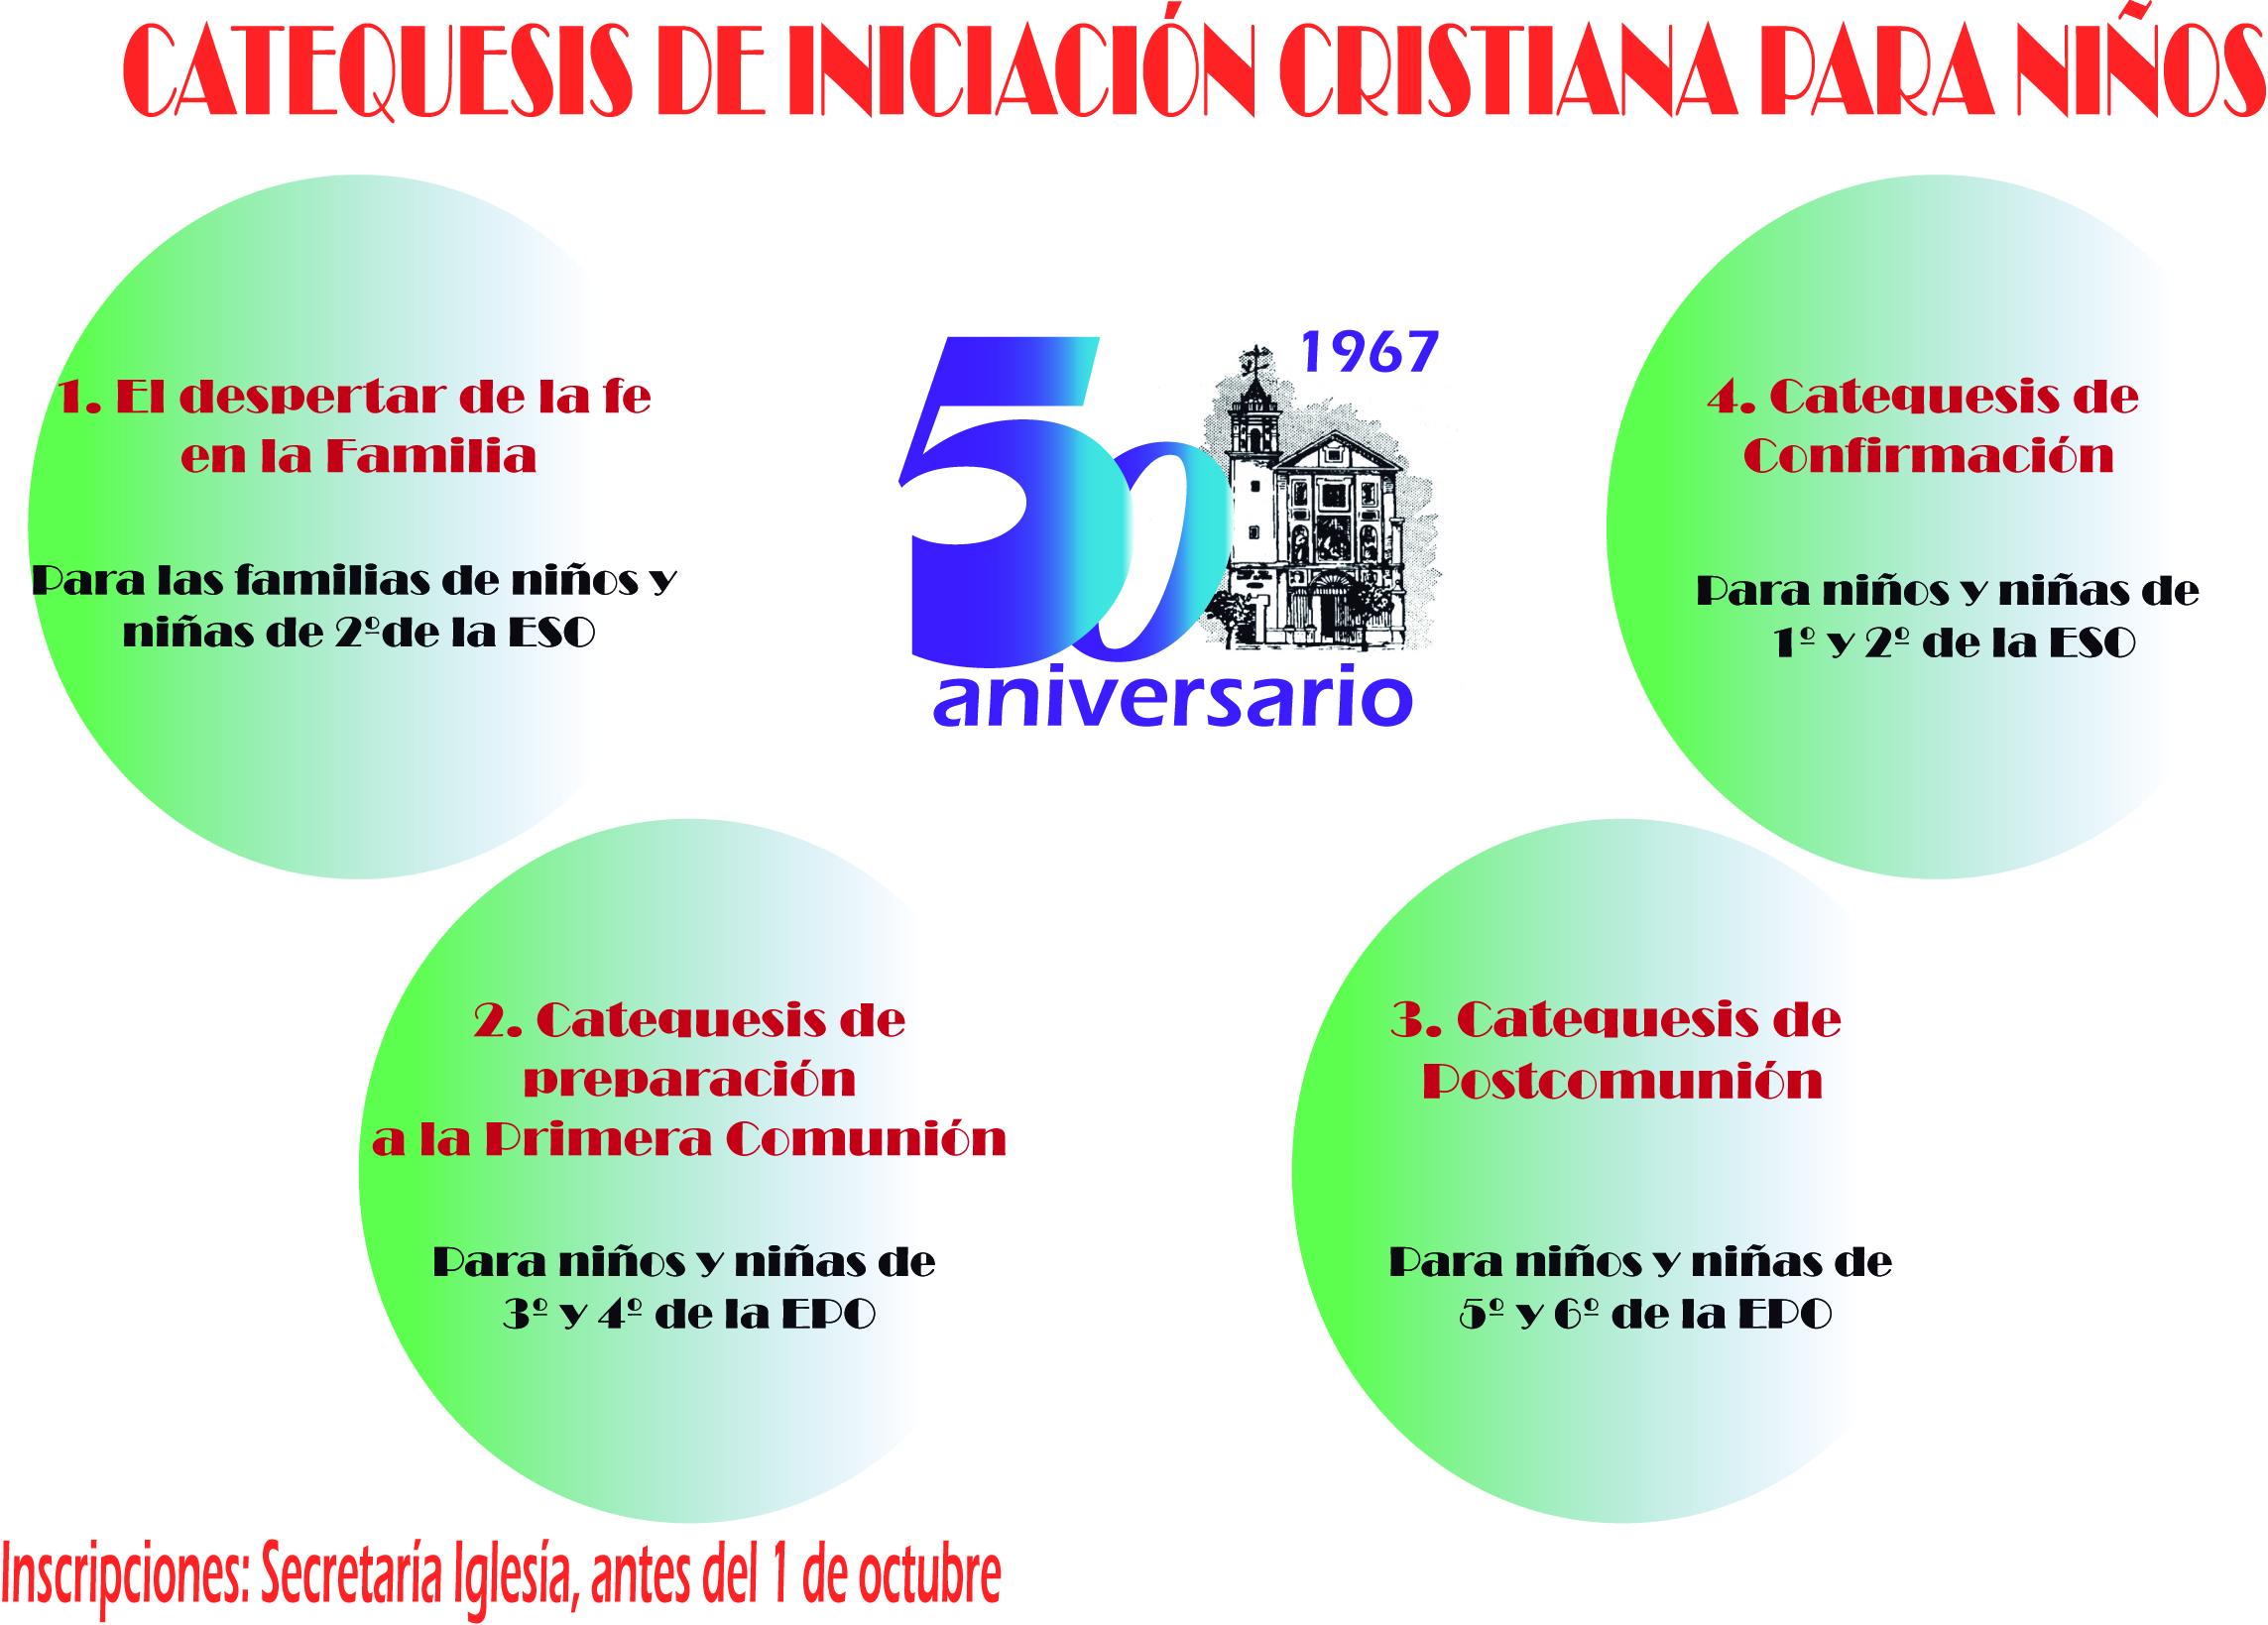 Catequesis17-18